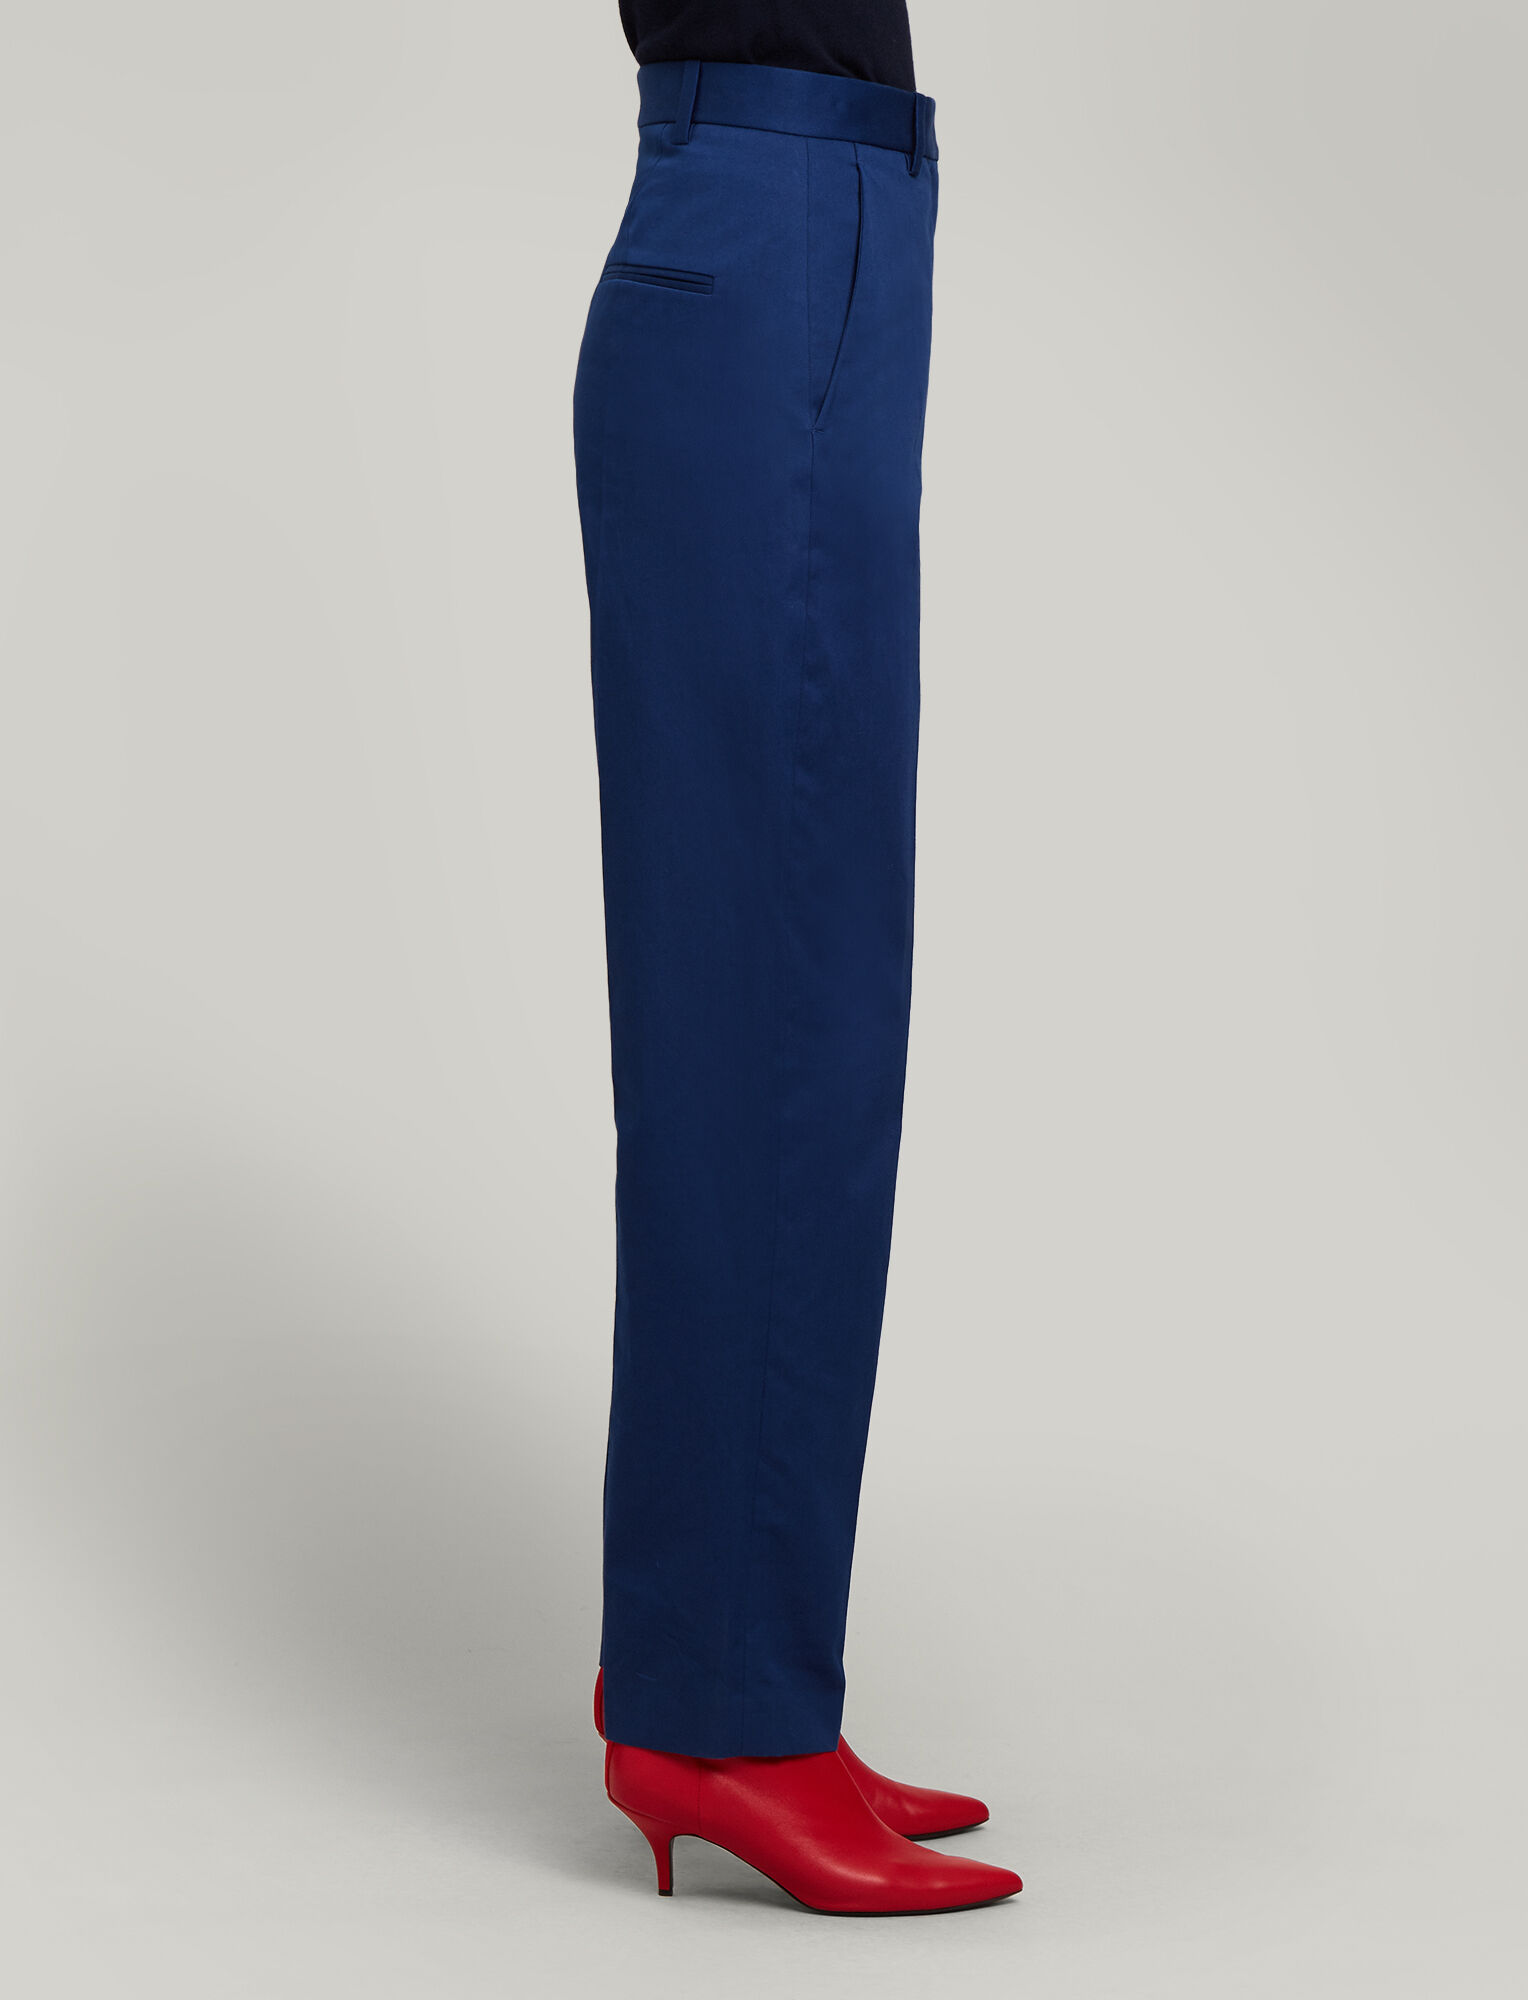 Joseph, Electra Everyday Chino Trousers, in INDIGO